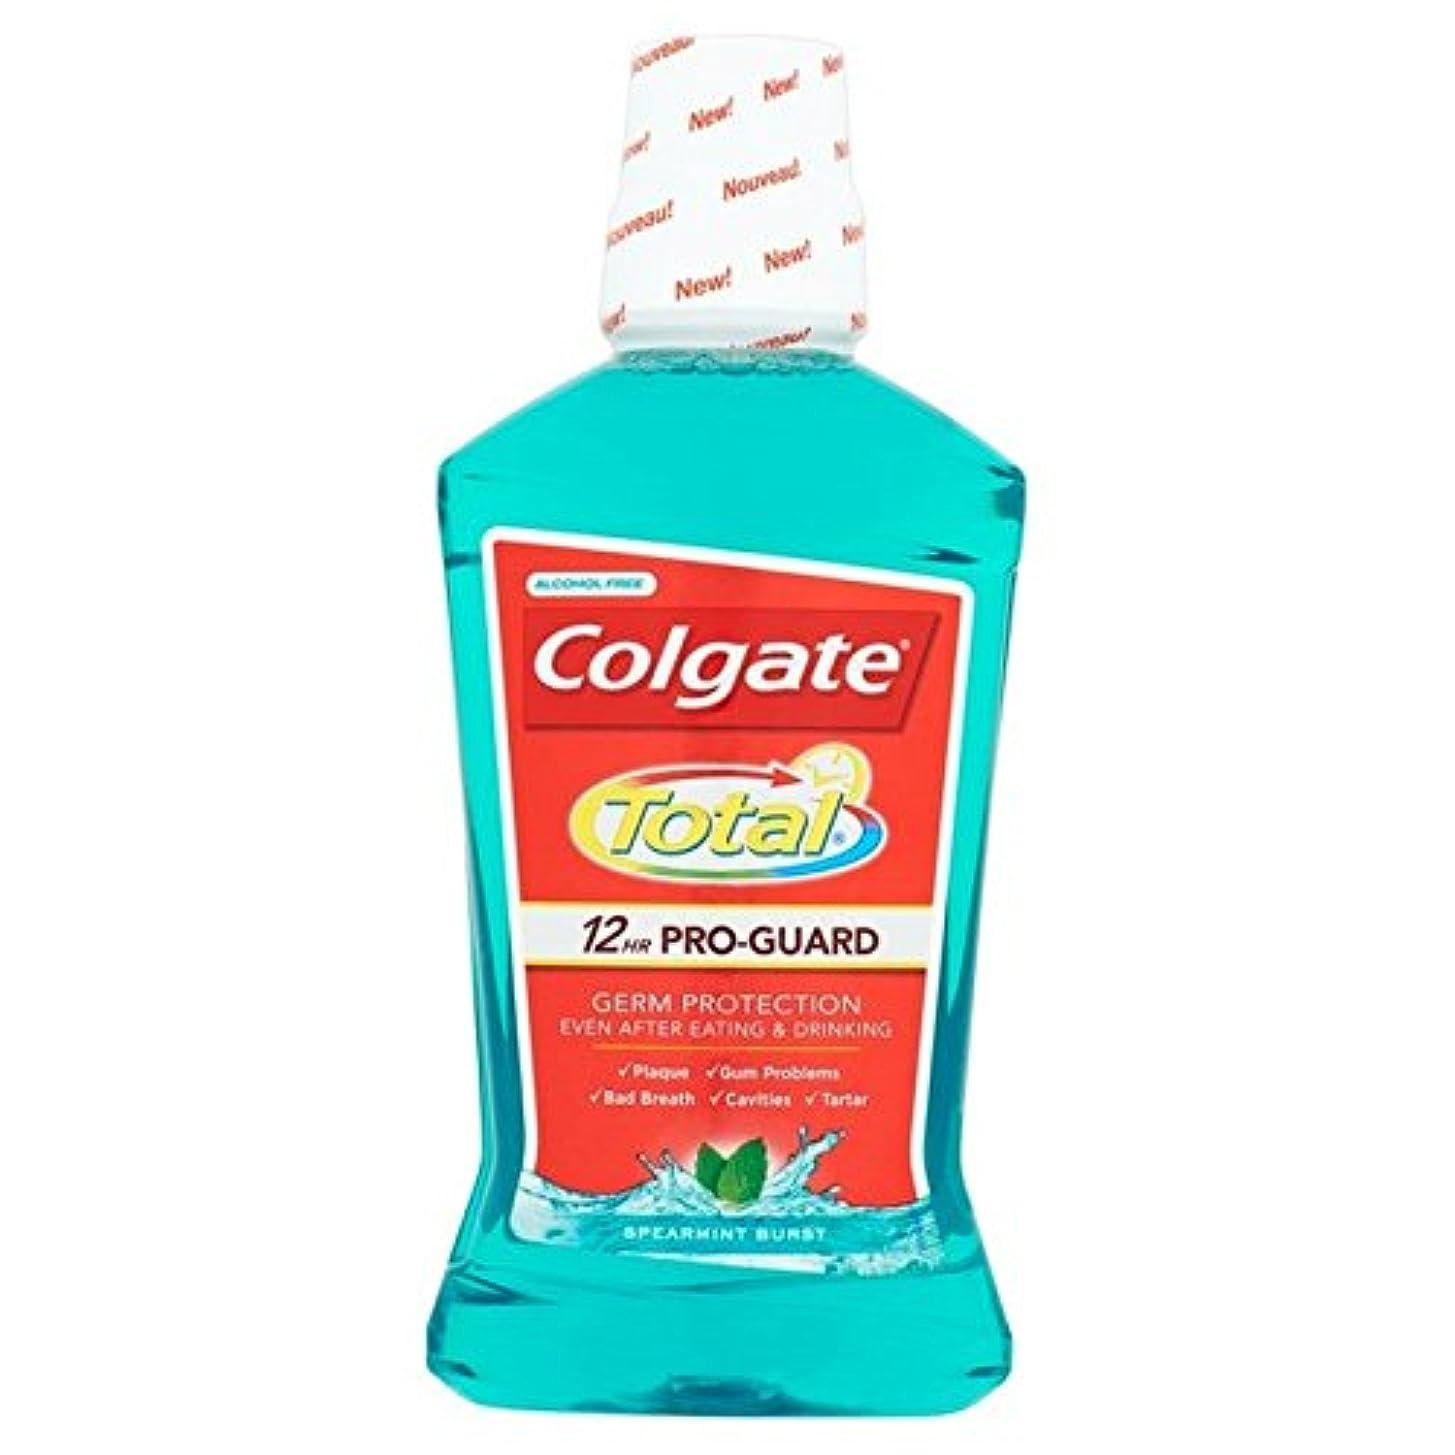 Colgate Total Advanced Green Mouthwash 500ml 500ml - コルゲートトータル先進的な緑色のマウスウォッシュ500ミリリットル500ミリリットル [並行輸入品]